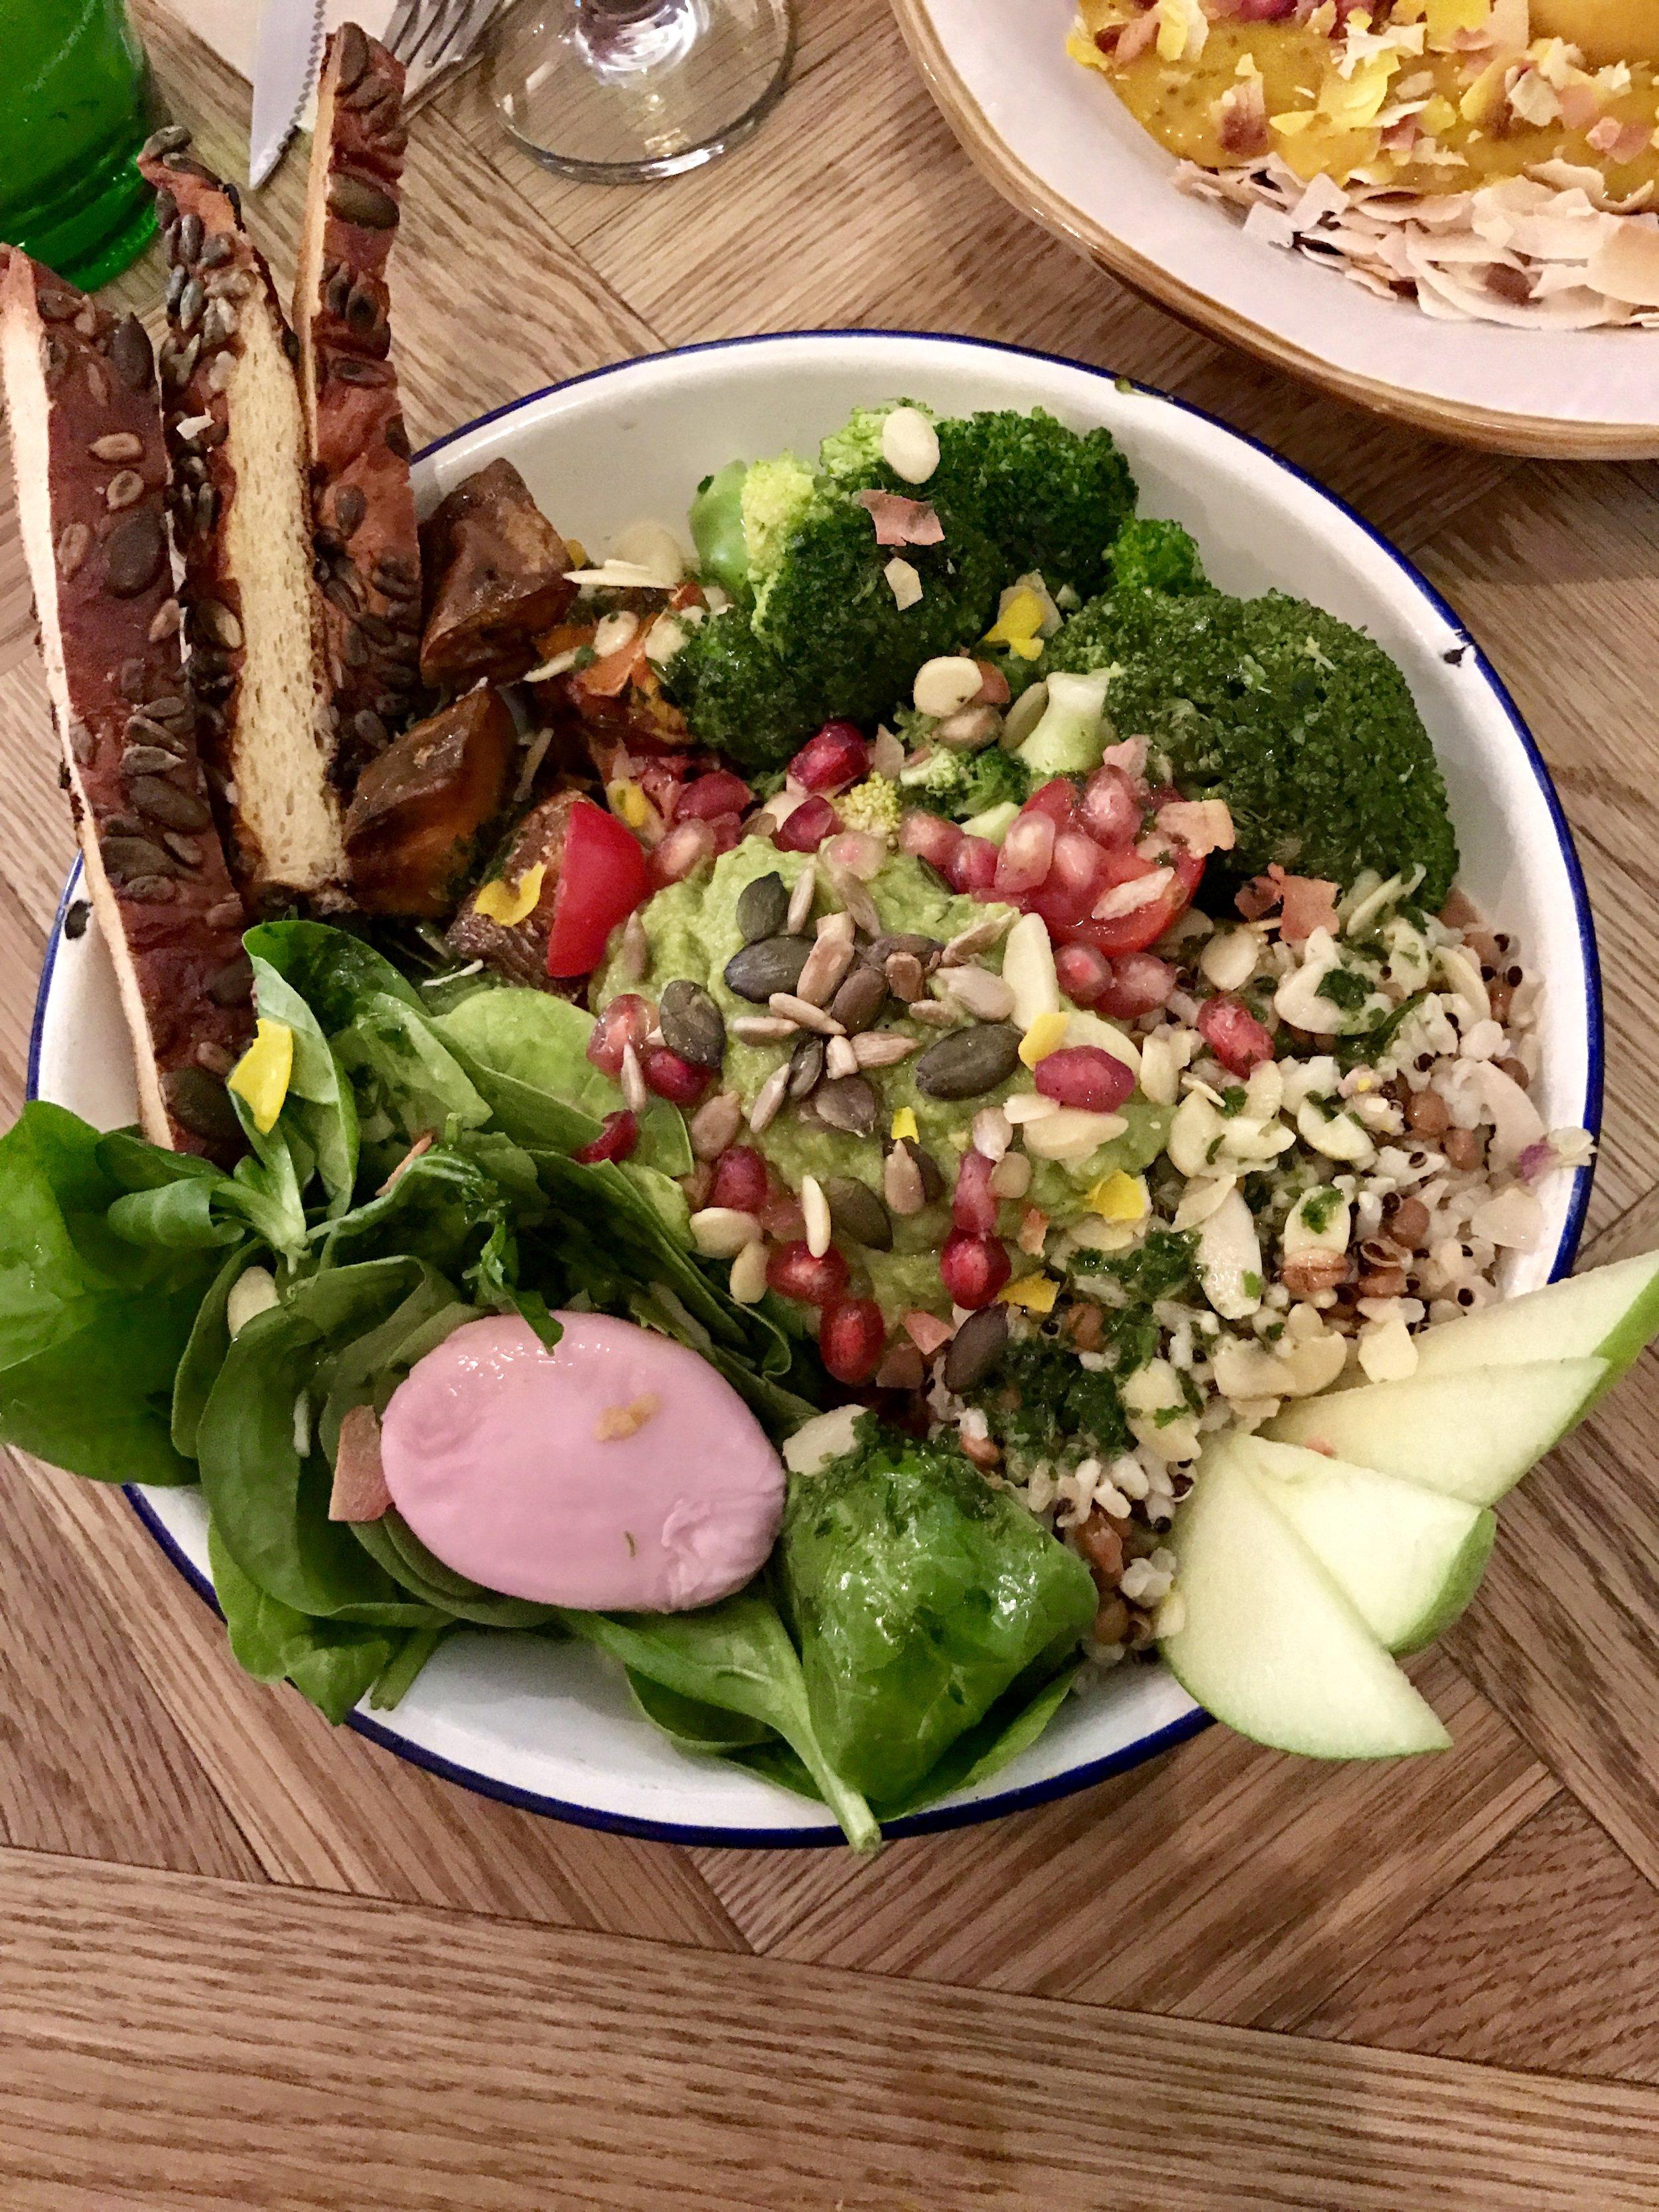 gluten free, vegan and paleo salads, easy way to eat more veggies